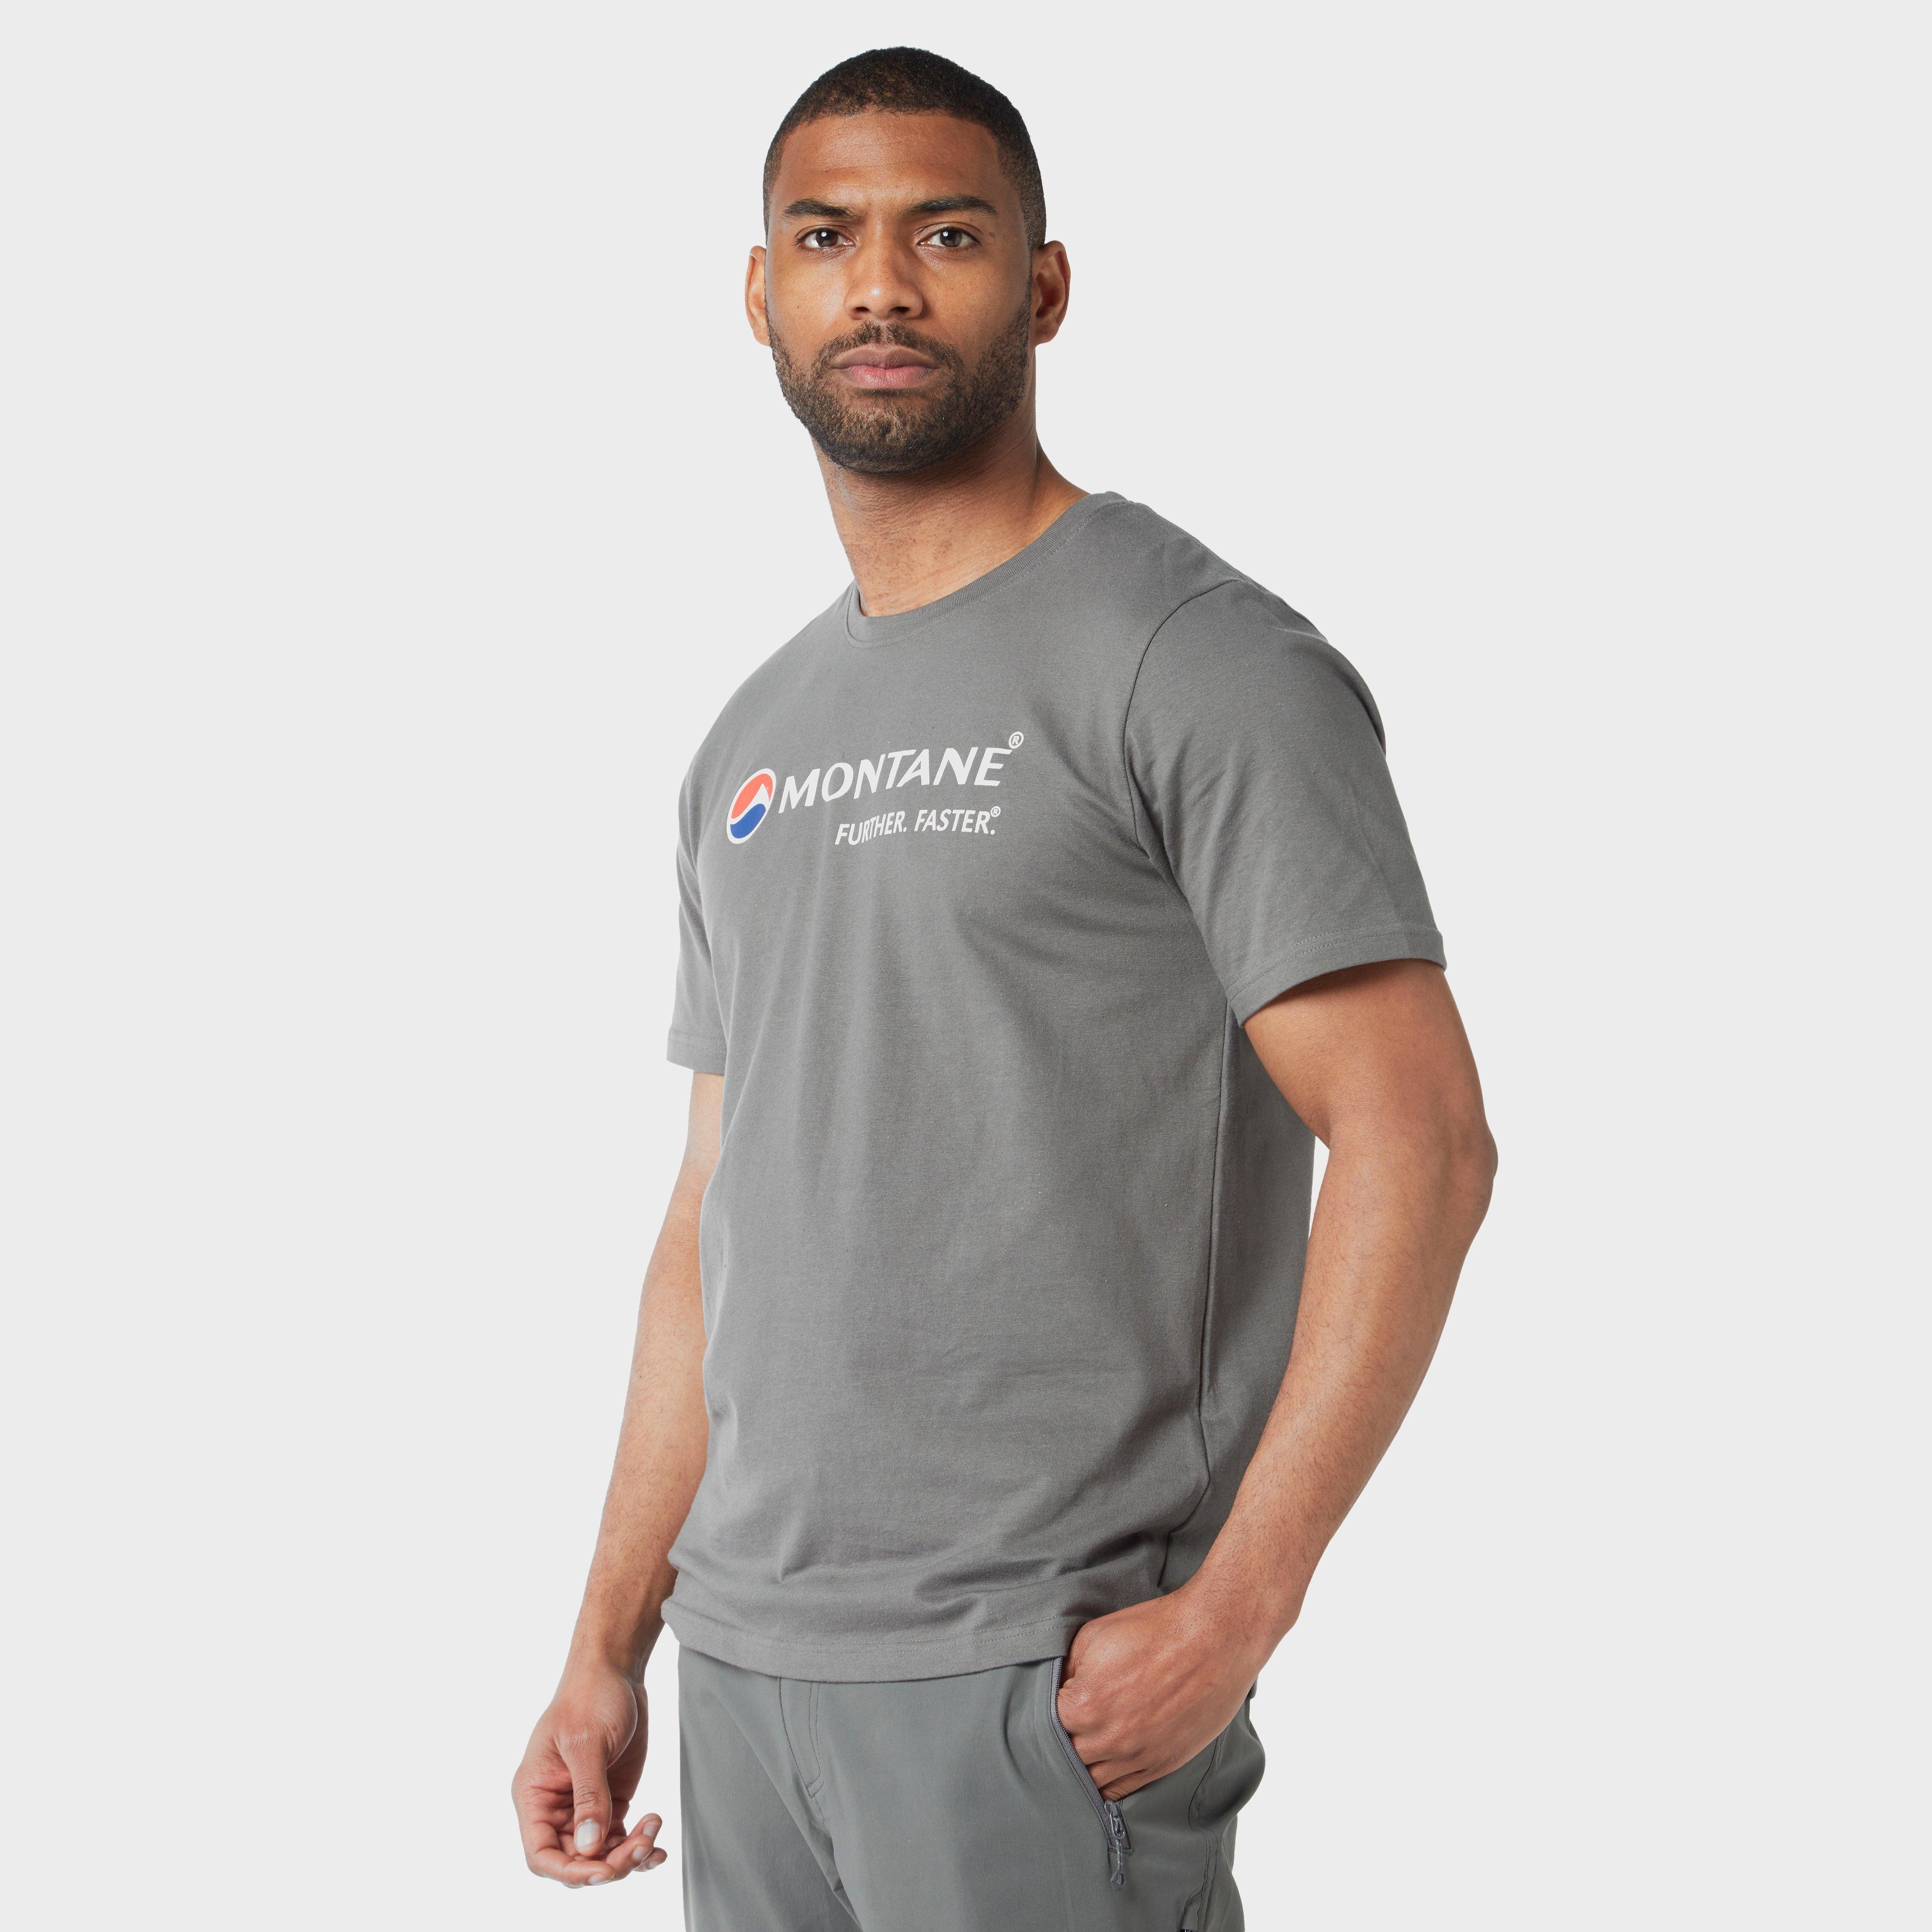 Montane Montane Mens Logo Tee - Grey, Grey